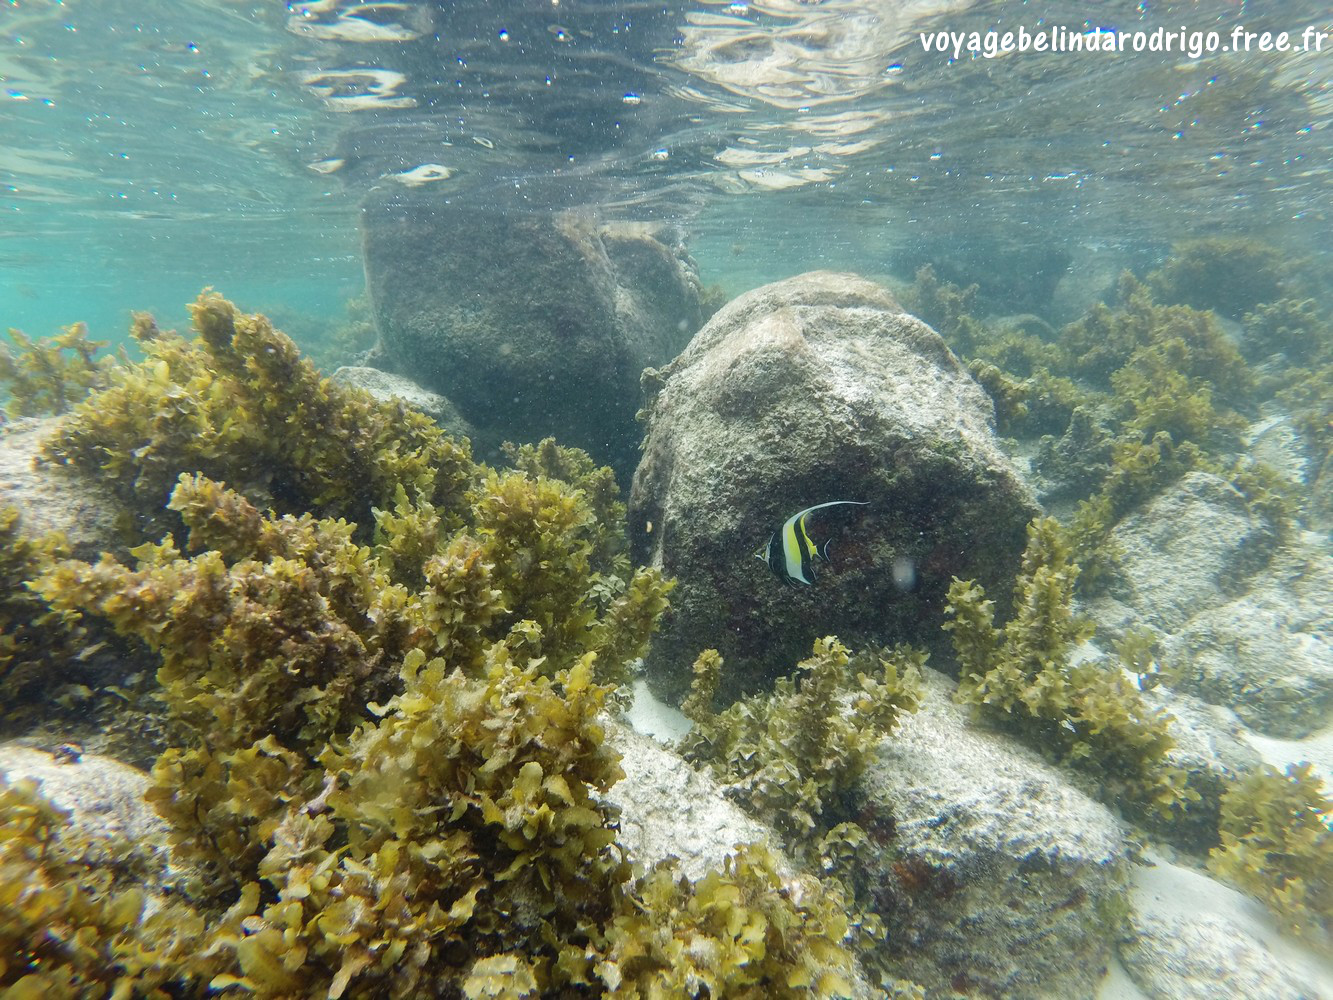 Poisson Idole des Maures - Snorkeling - Anse Royale - Mahé